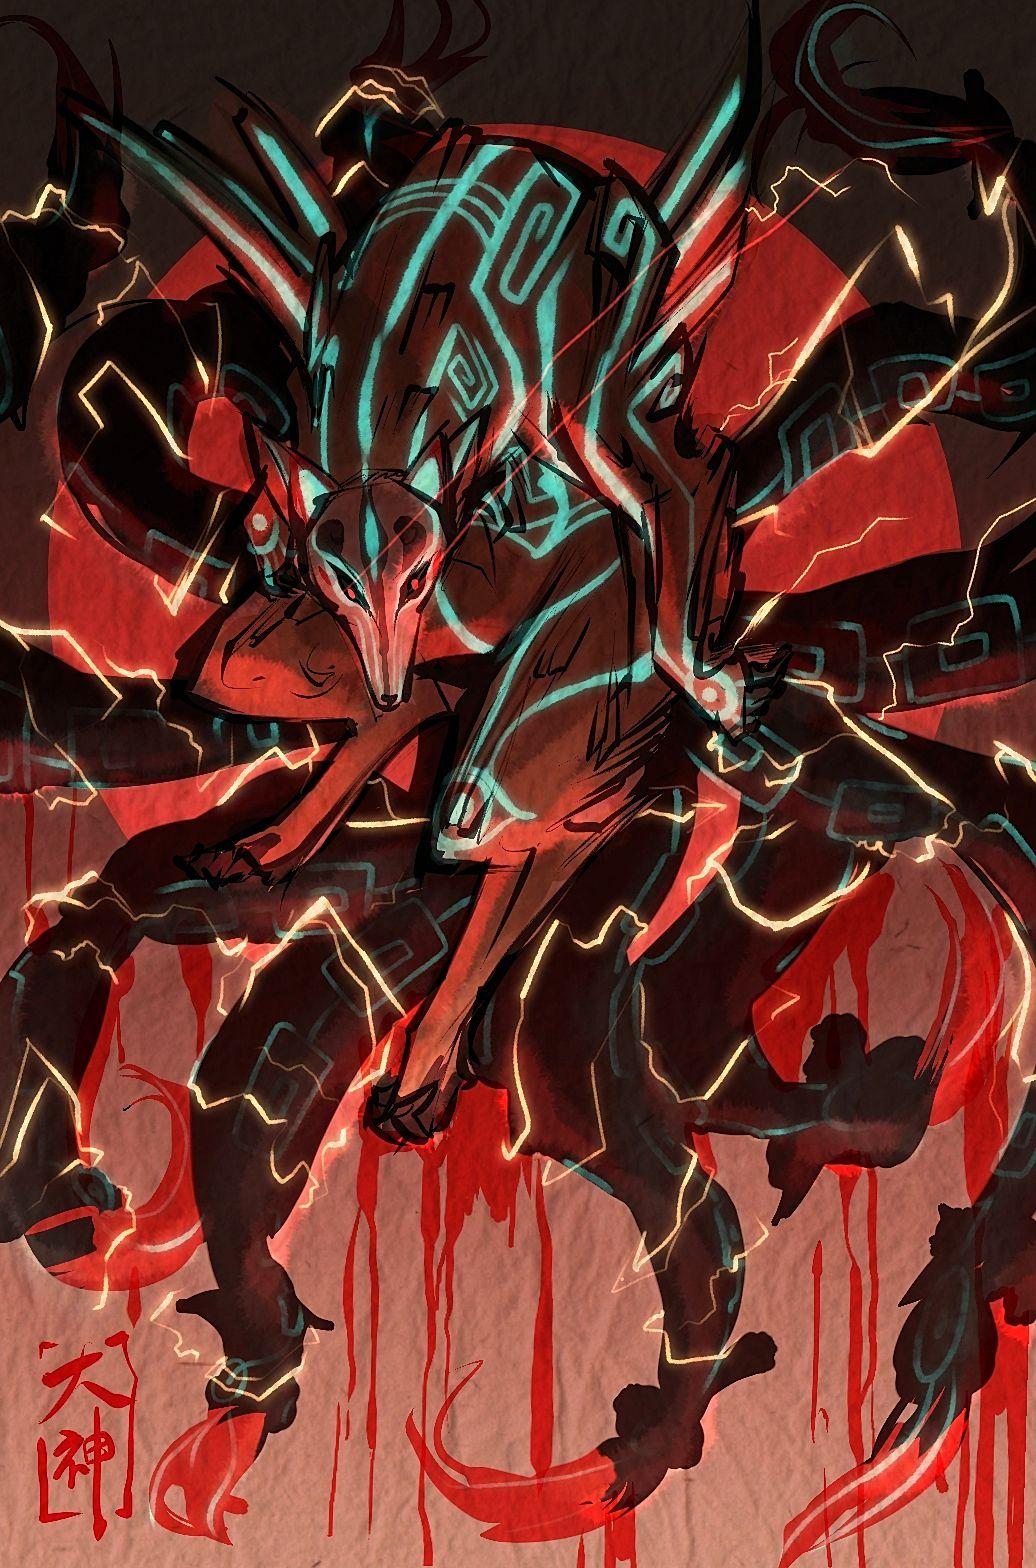 ninetails okami mobile wallpaper 923274 zerochan